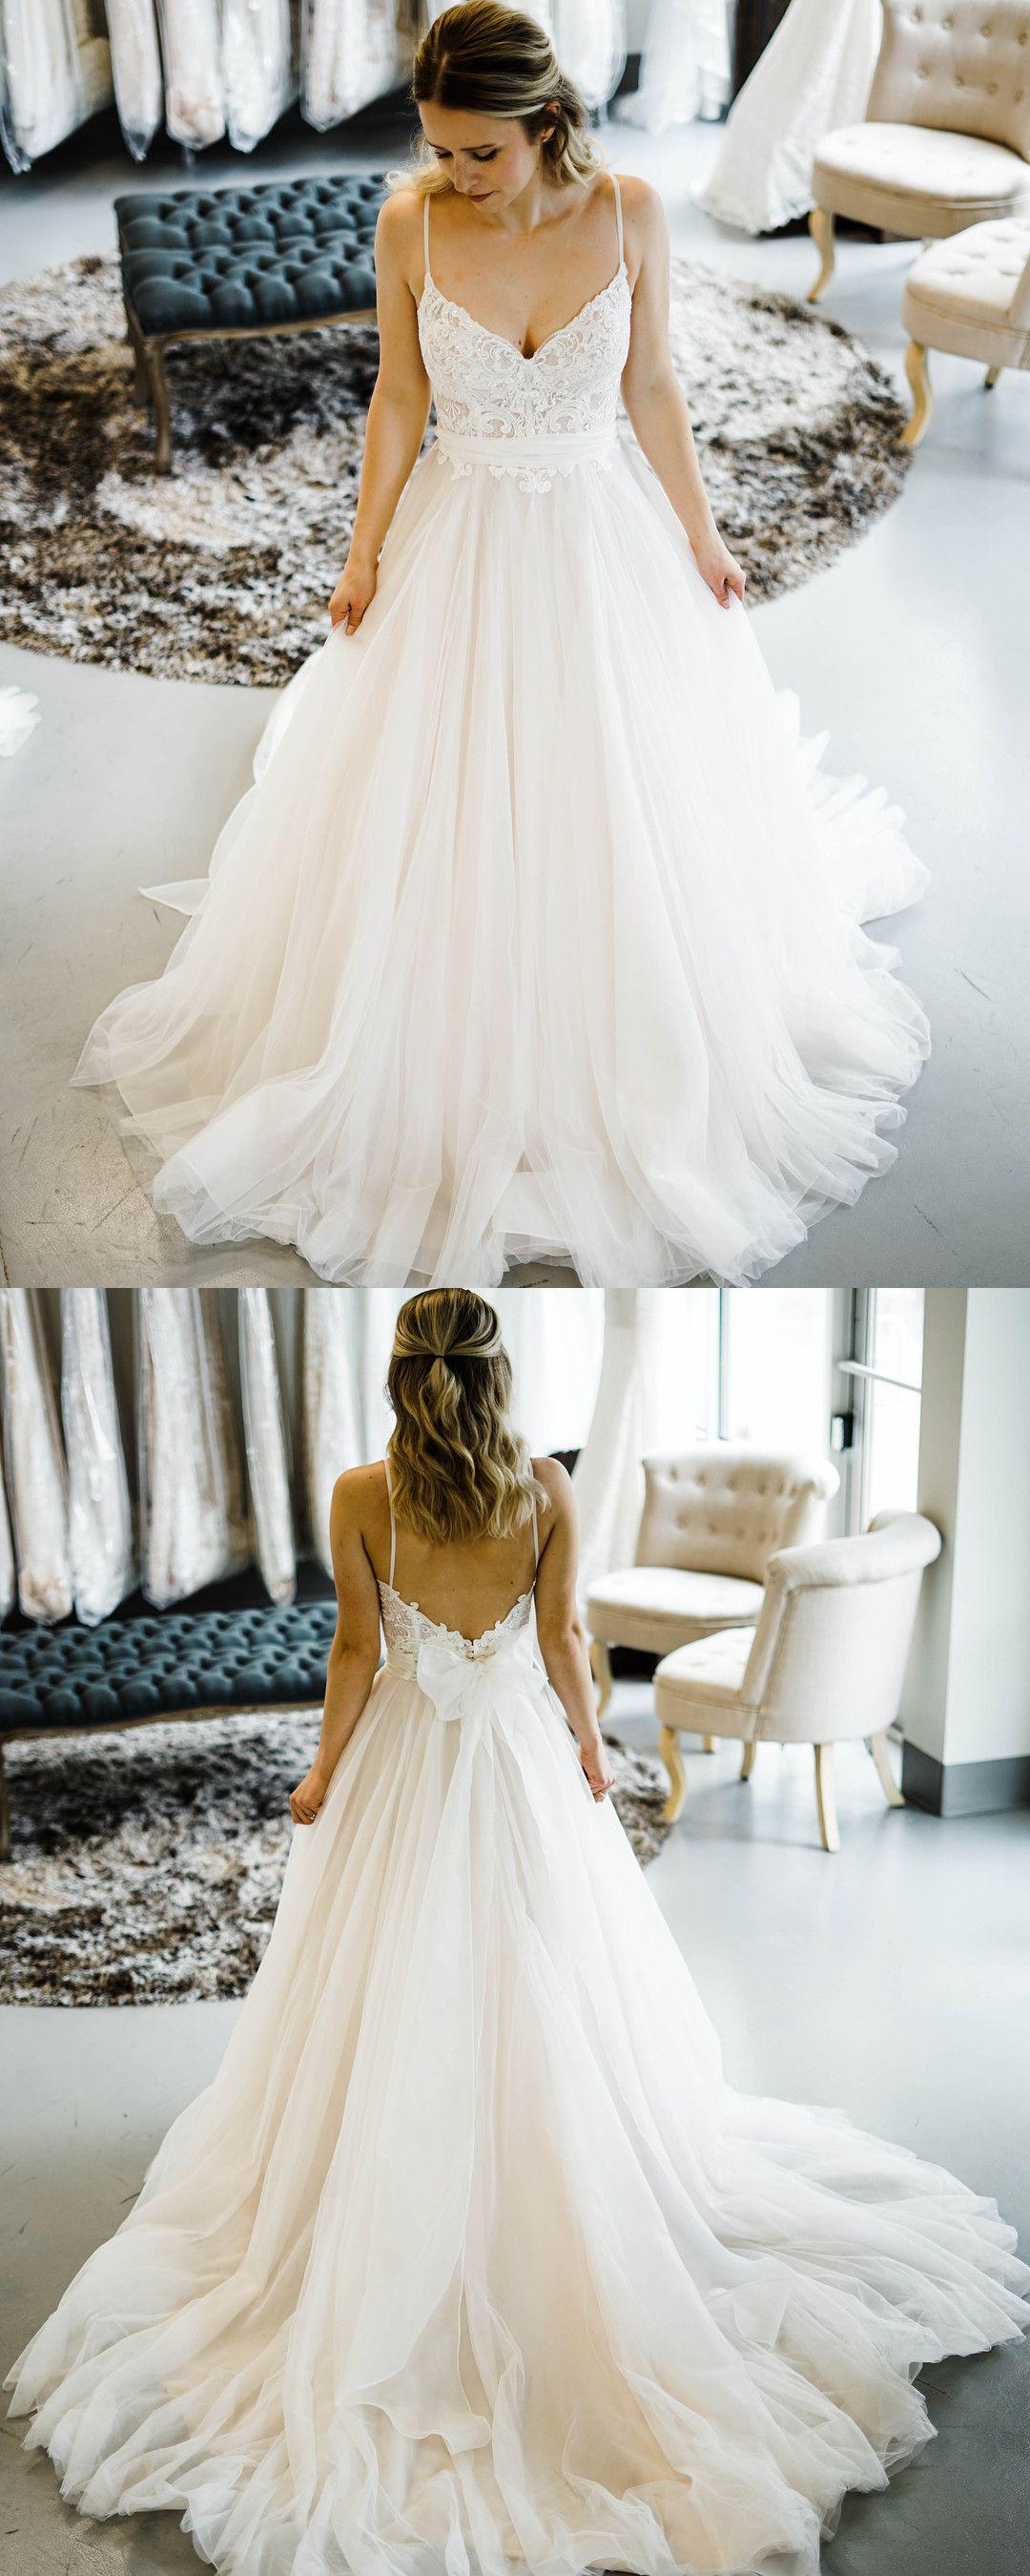 Spaghetti strap ivory train long wedding dress in prom